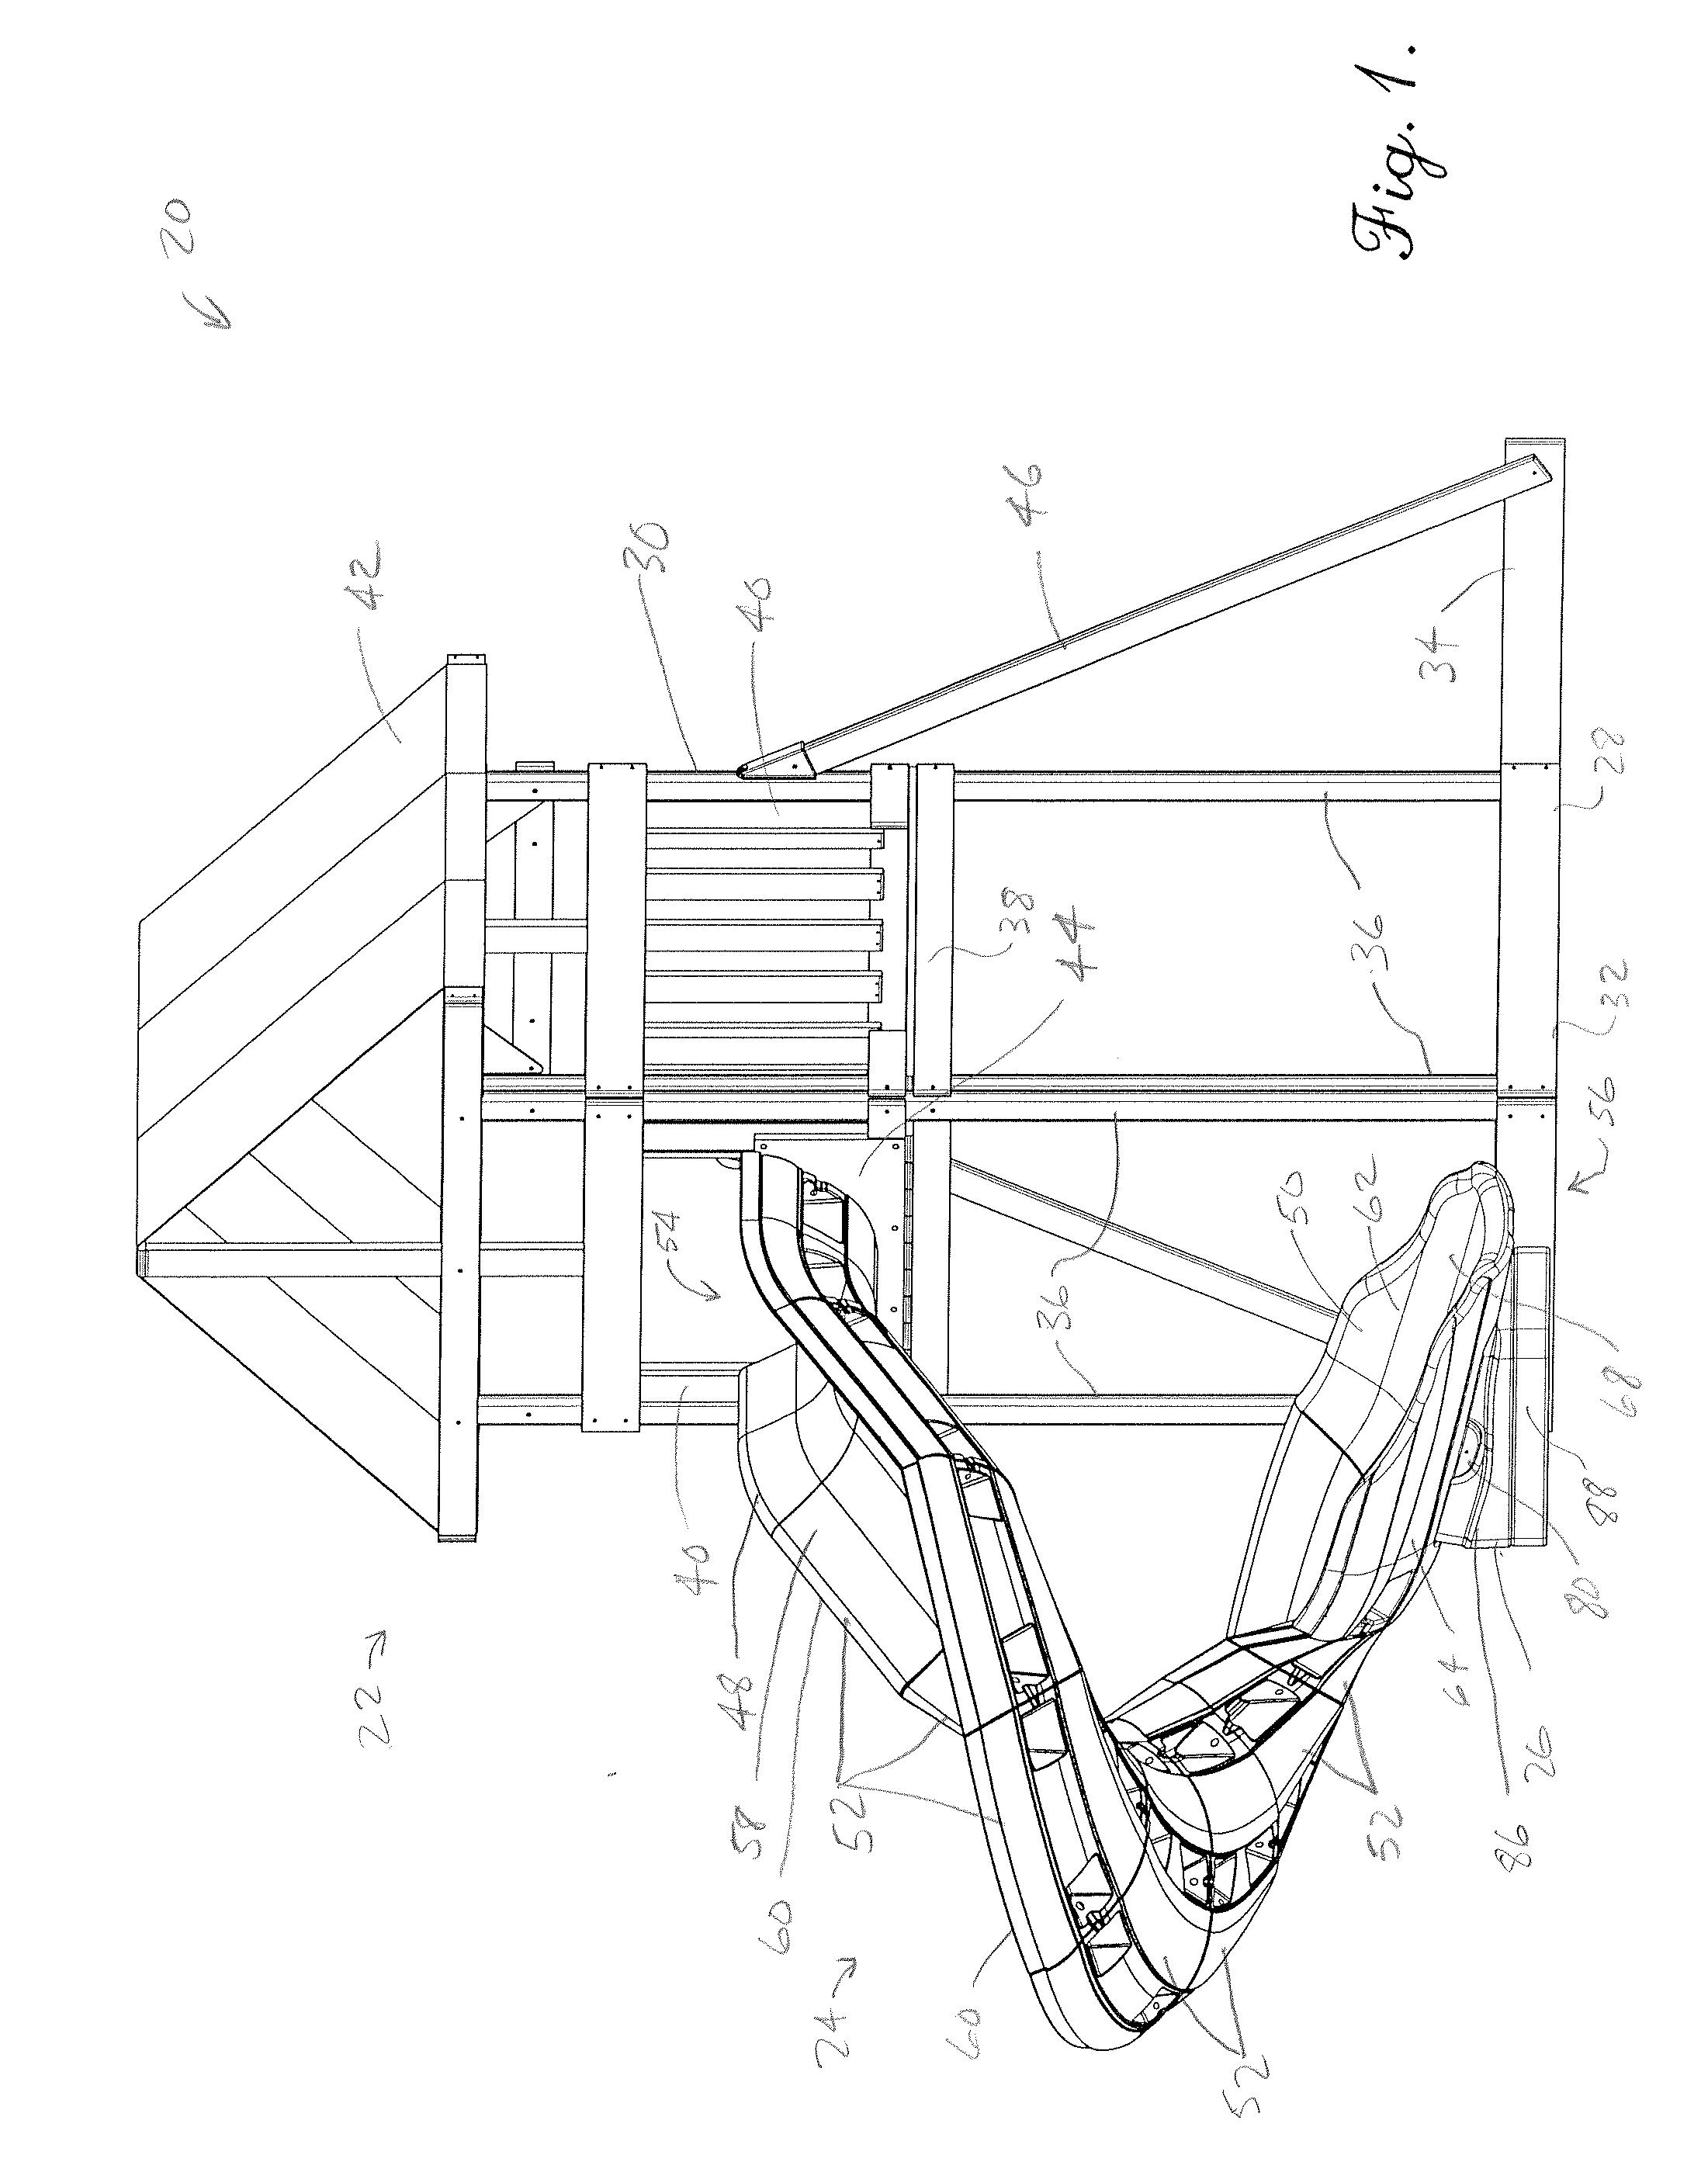 patent us20110086717 adjustable height slide base google patents